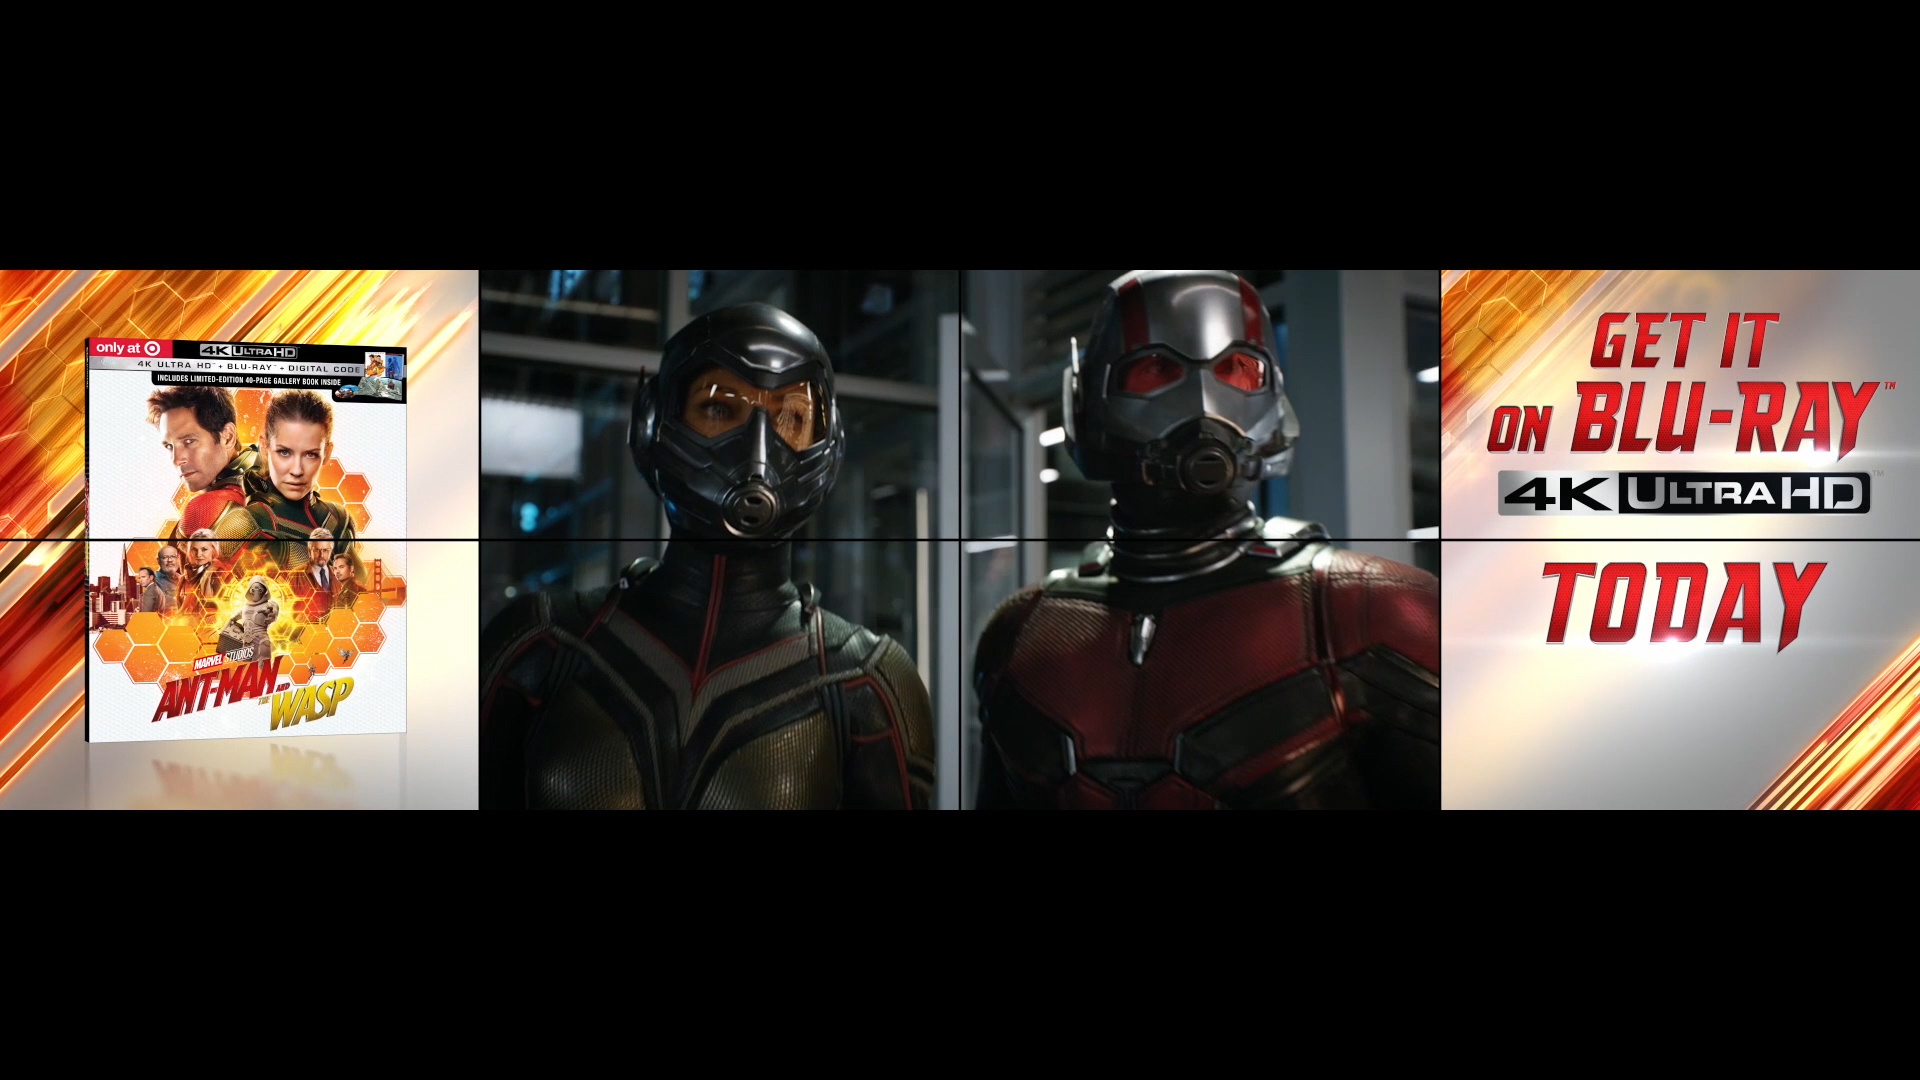 Thumbnail for Ant-Man & The Wasp - Target Wall